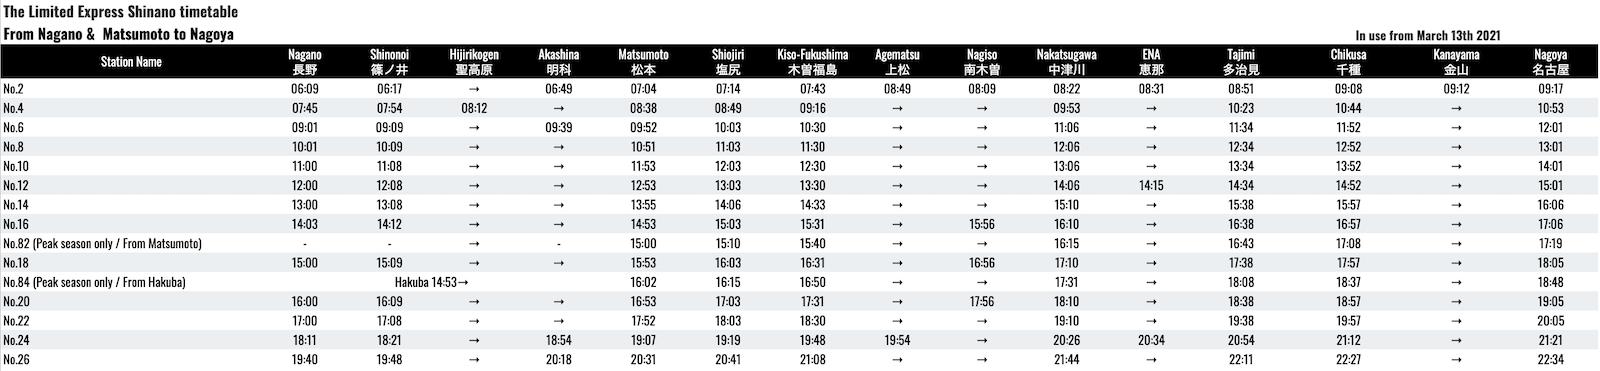 Limited-Express-Shinano-Line-Timetable-Nagano-Nagoya-2021